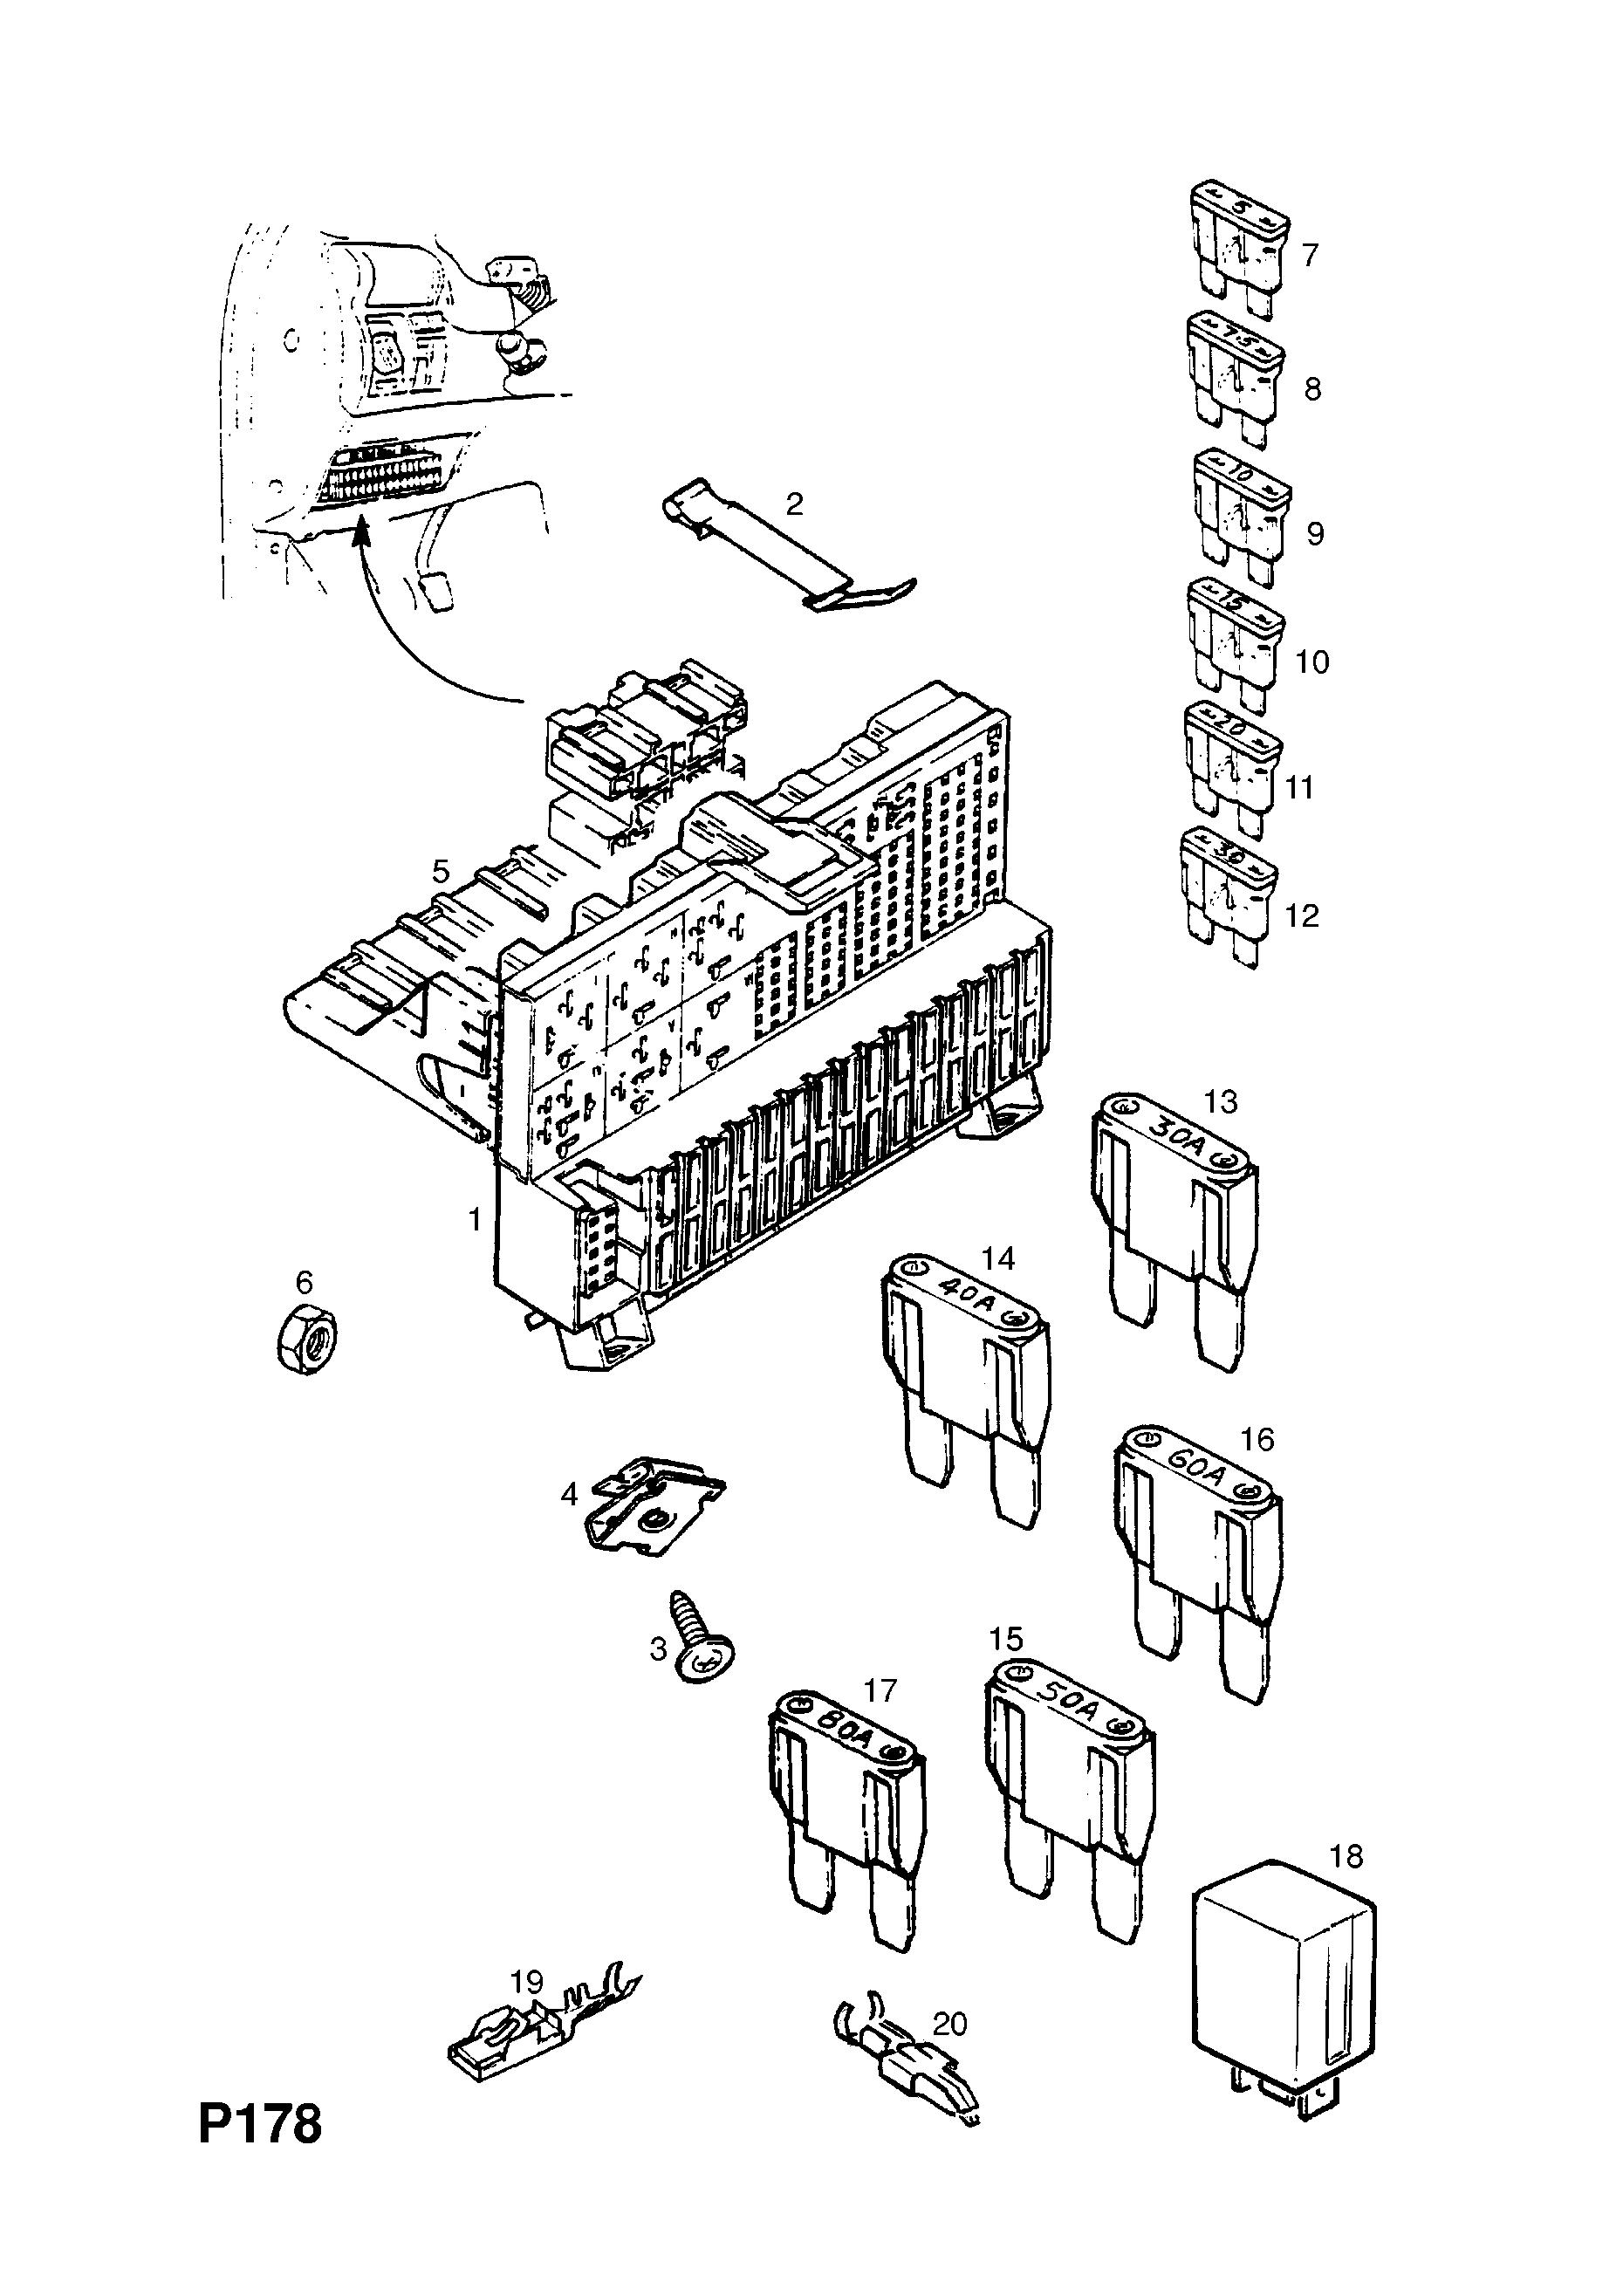 Opel Astra F Wiring Diagram